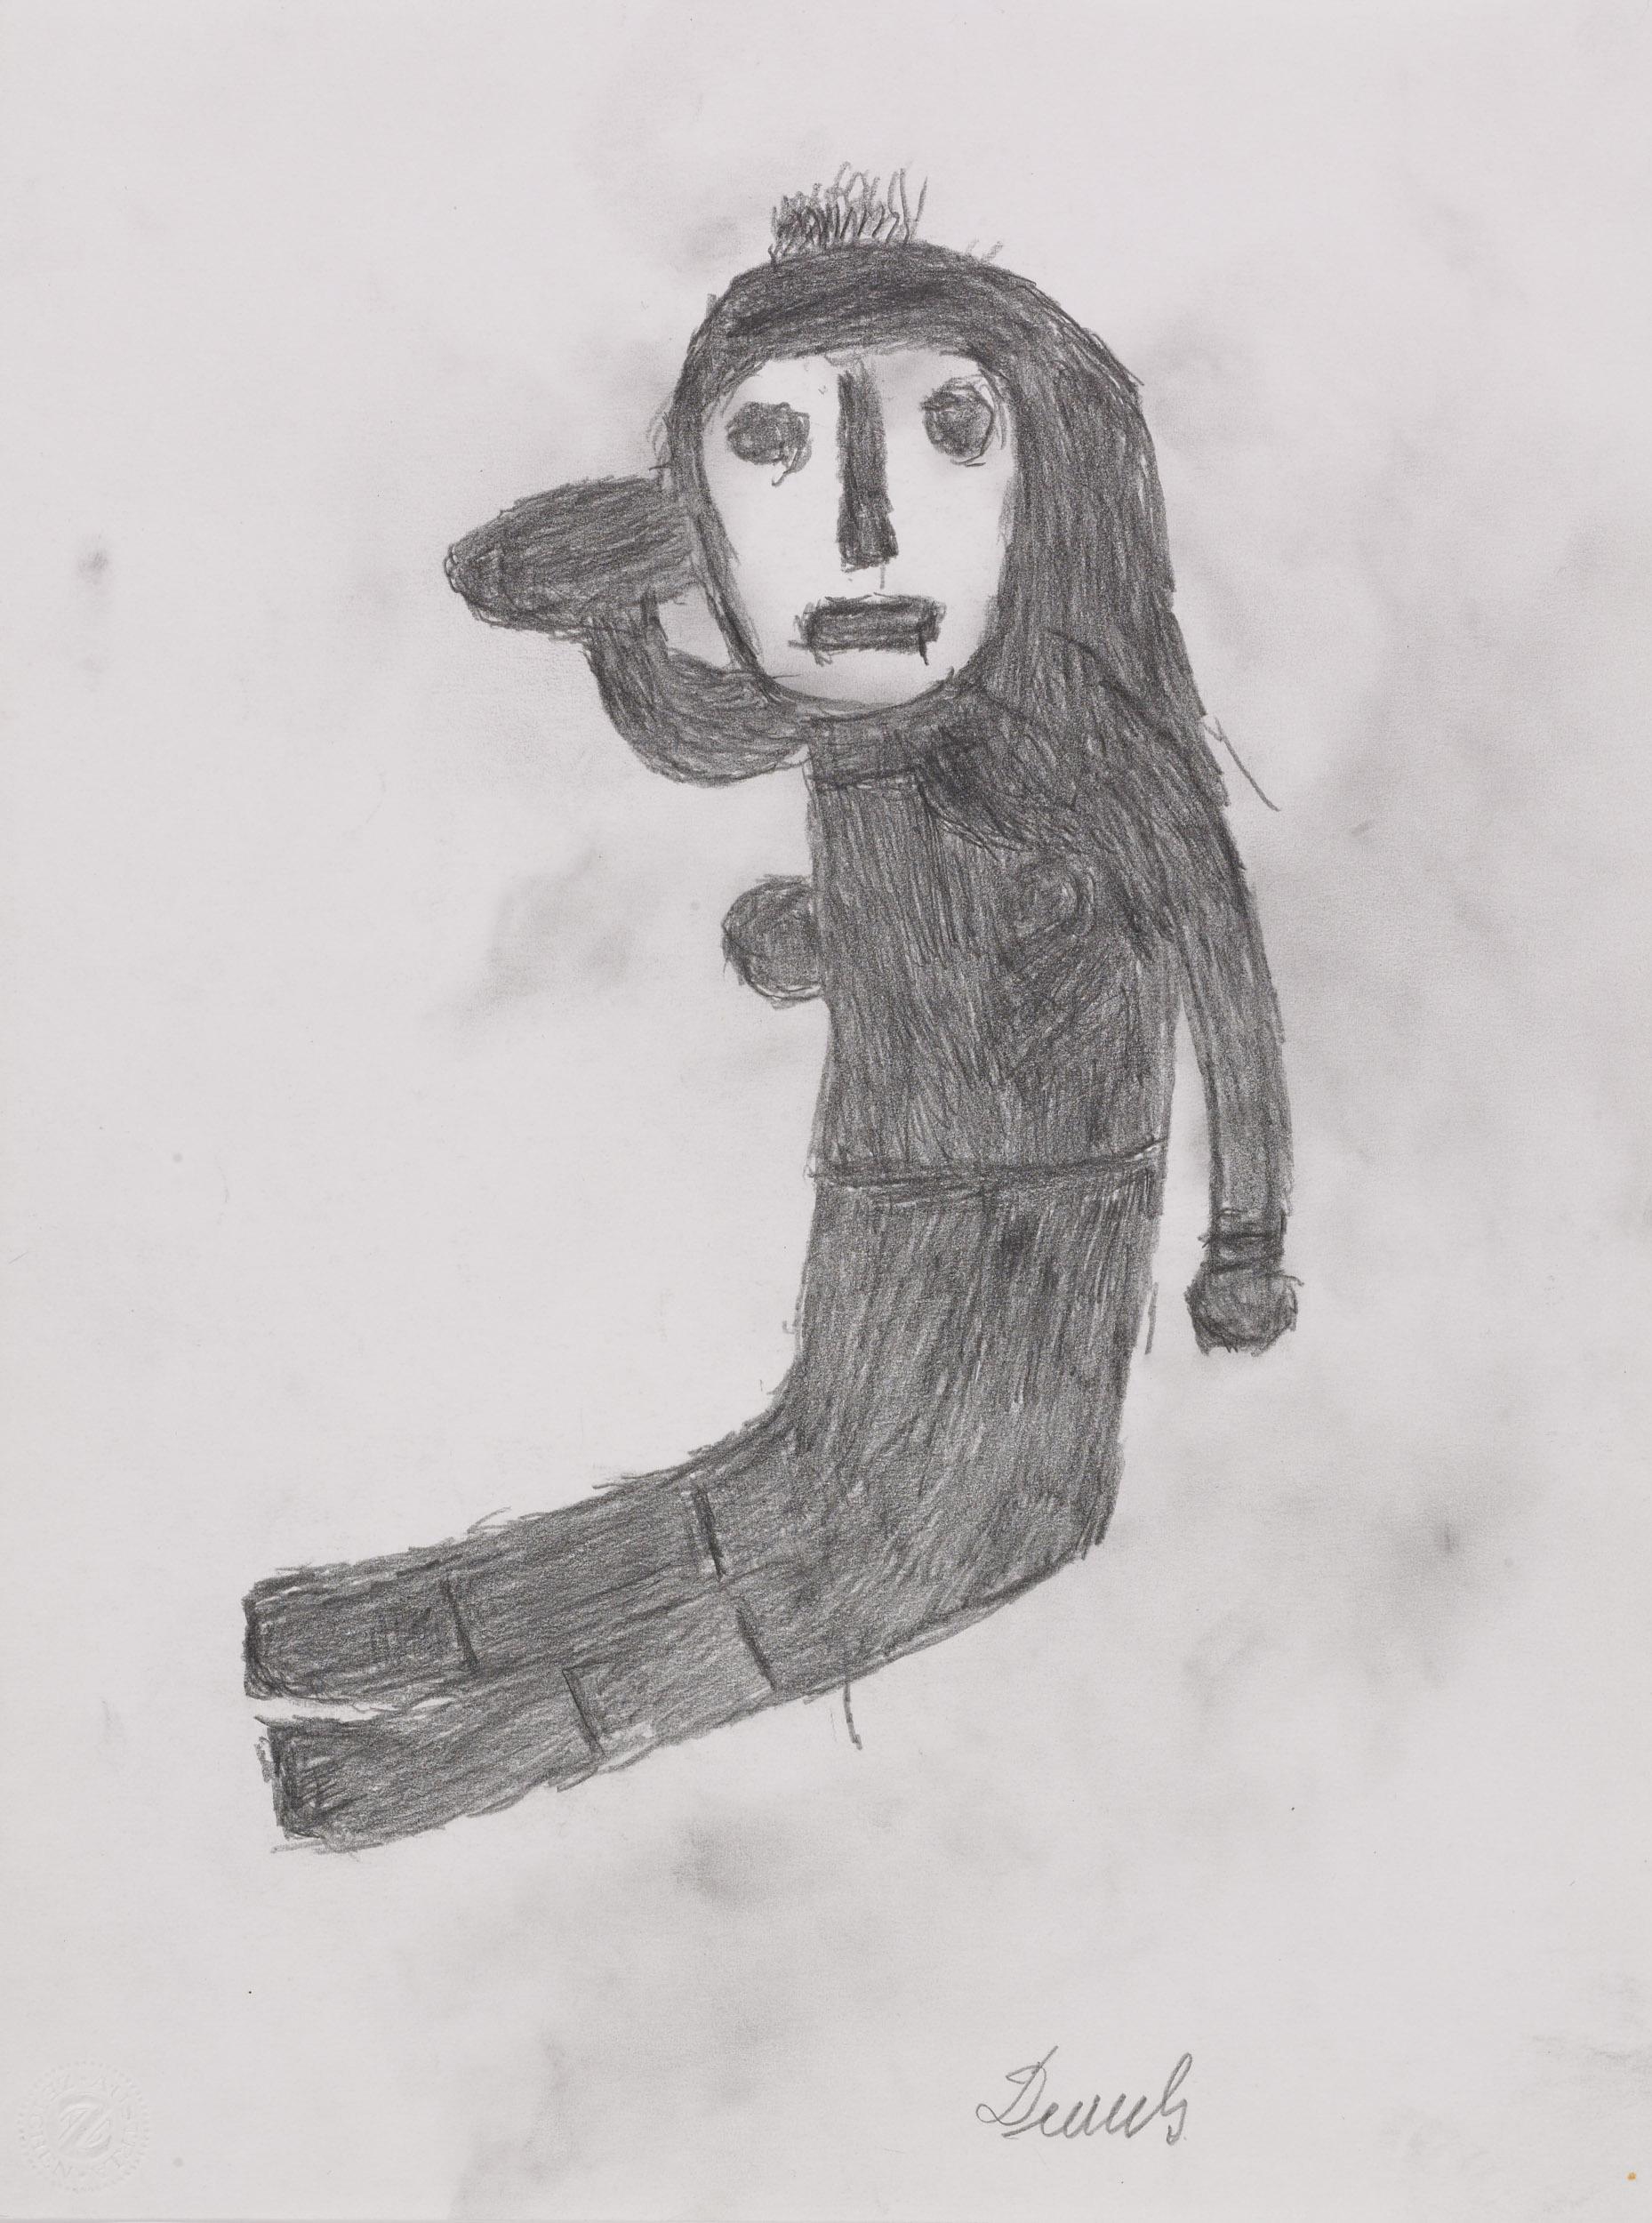 dobay anton - Frau (nach Hauser) / Woman (after Hauser)